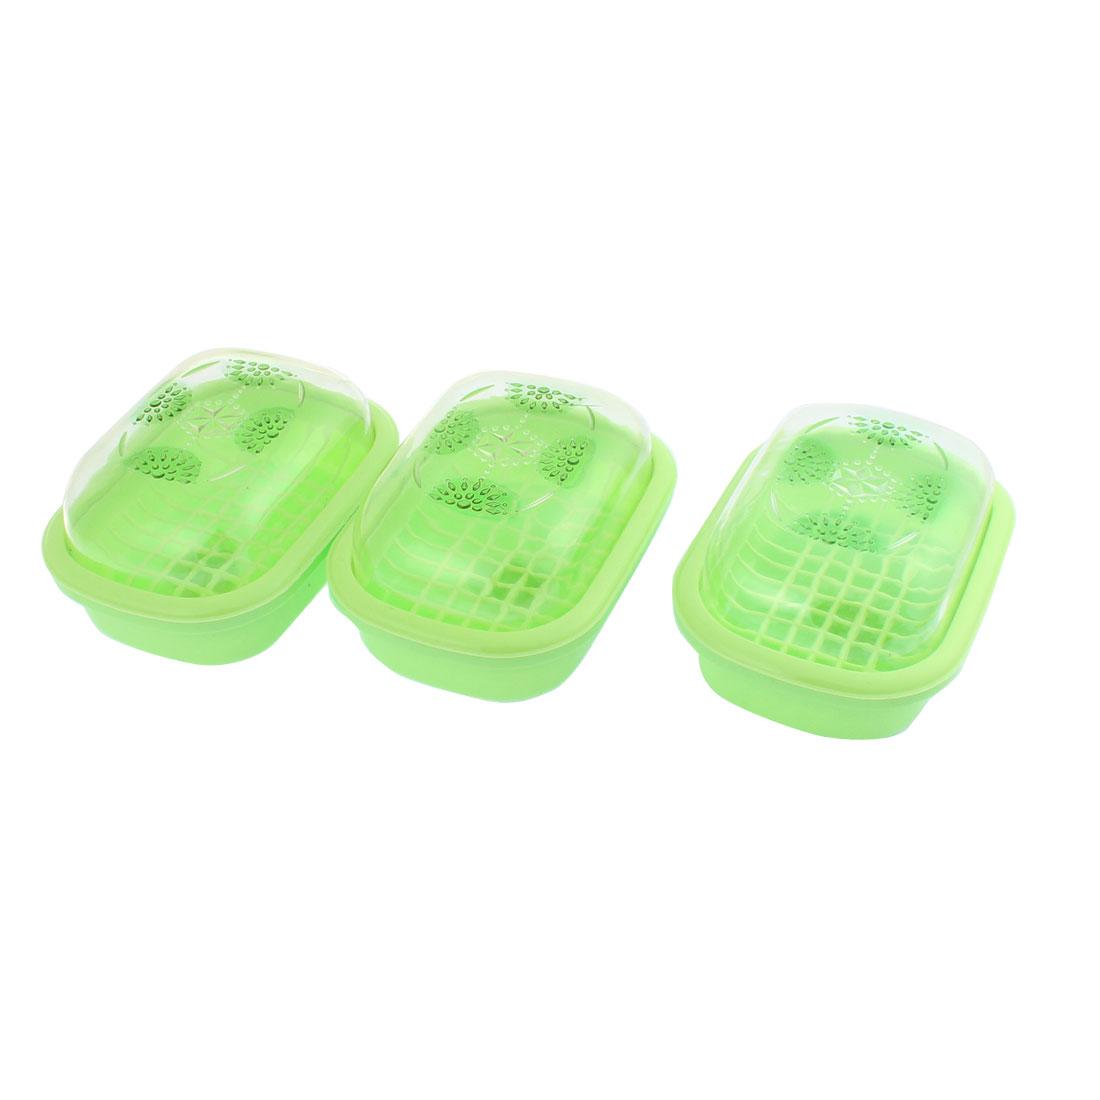 Plastic Rhinestone Pattern Dual Layer Soap Dish Case Holder Green 3 Pcs